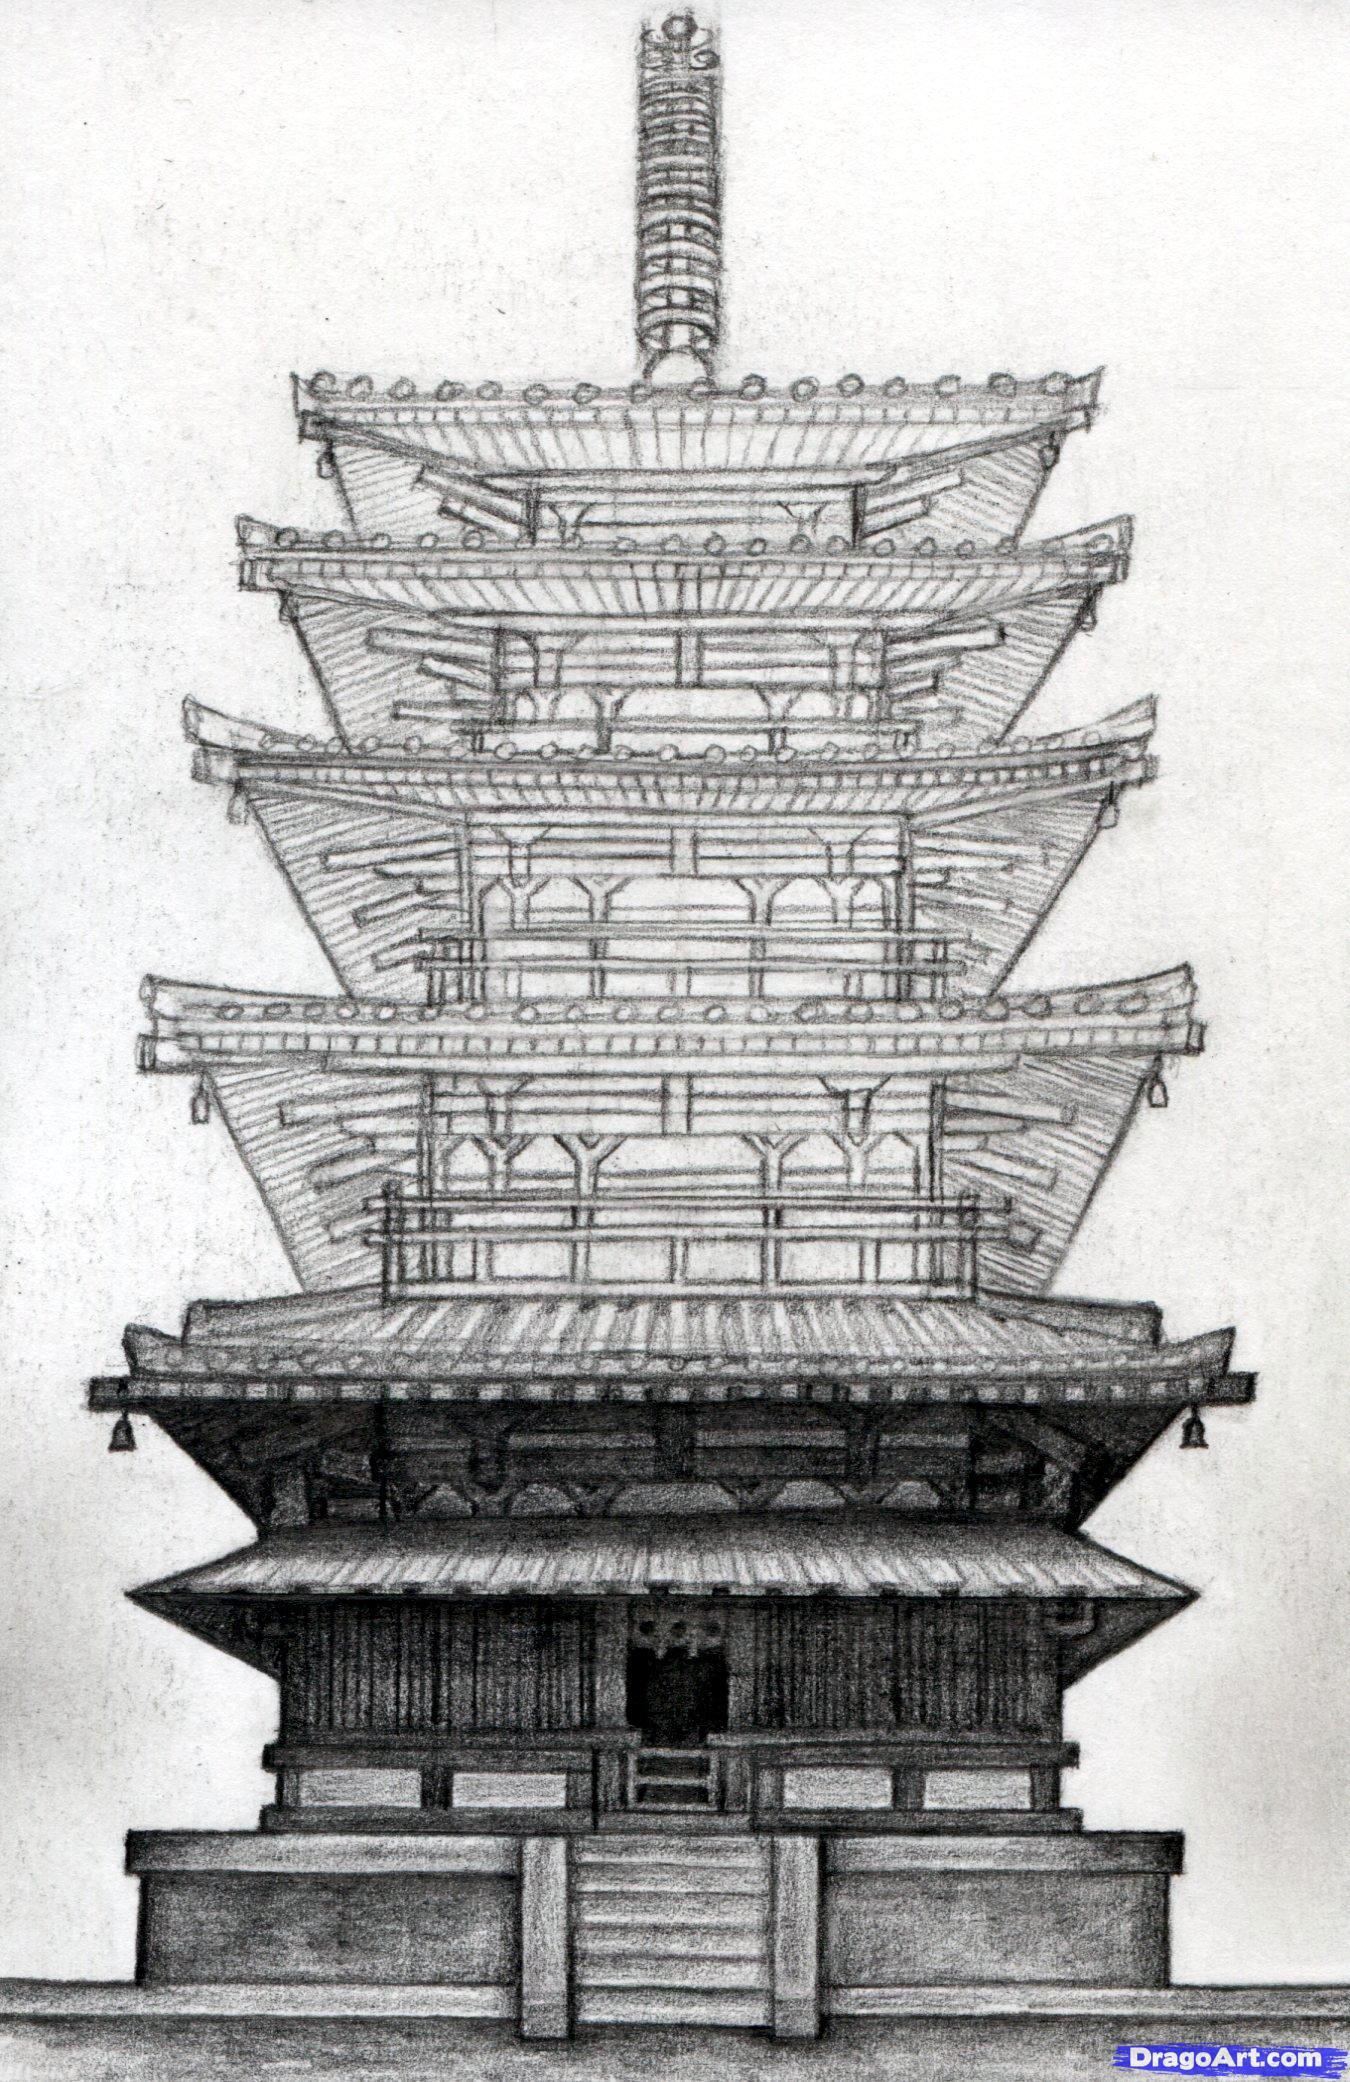 Drawn samurai temple Pagoda step terryconstant how ClipArt